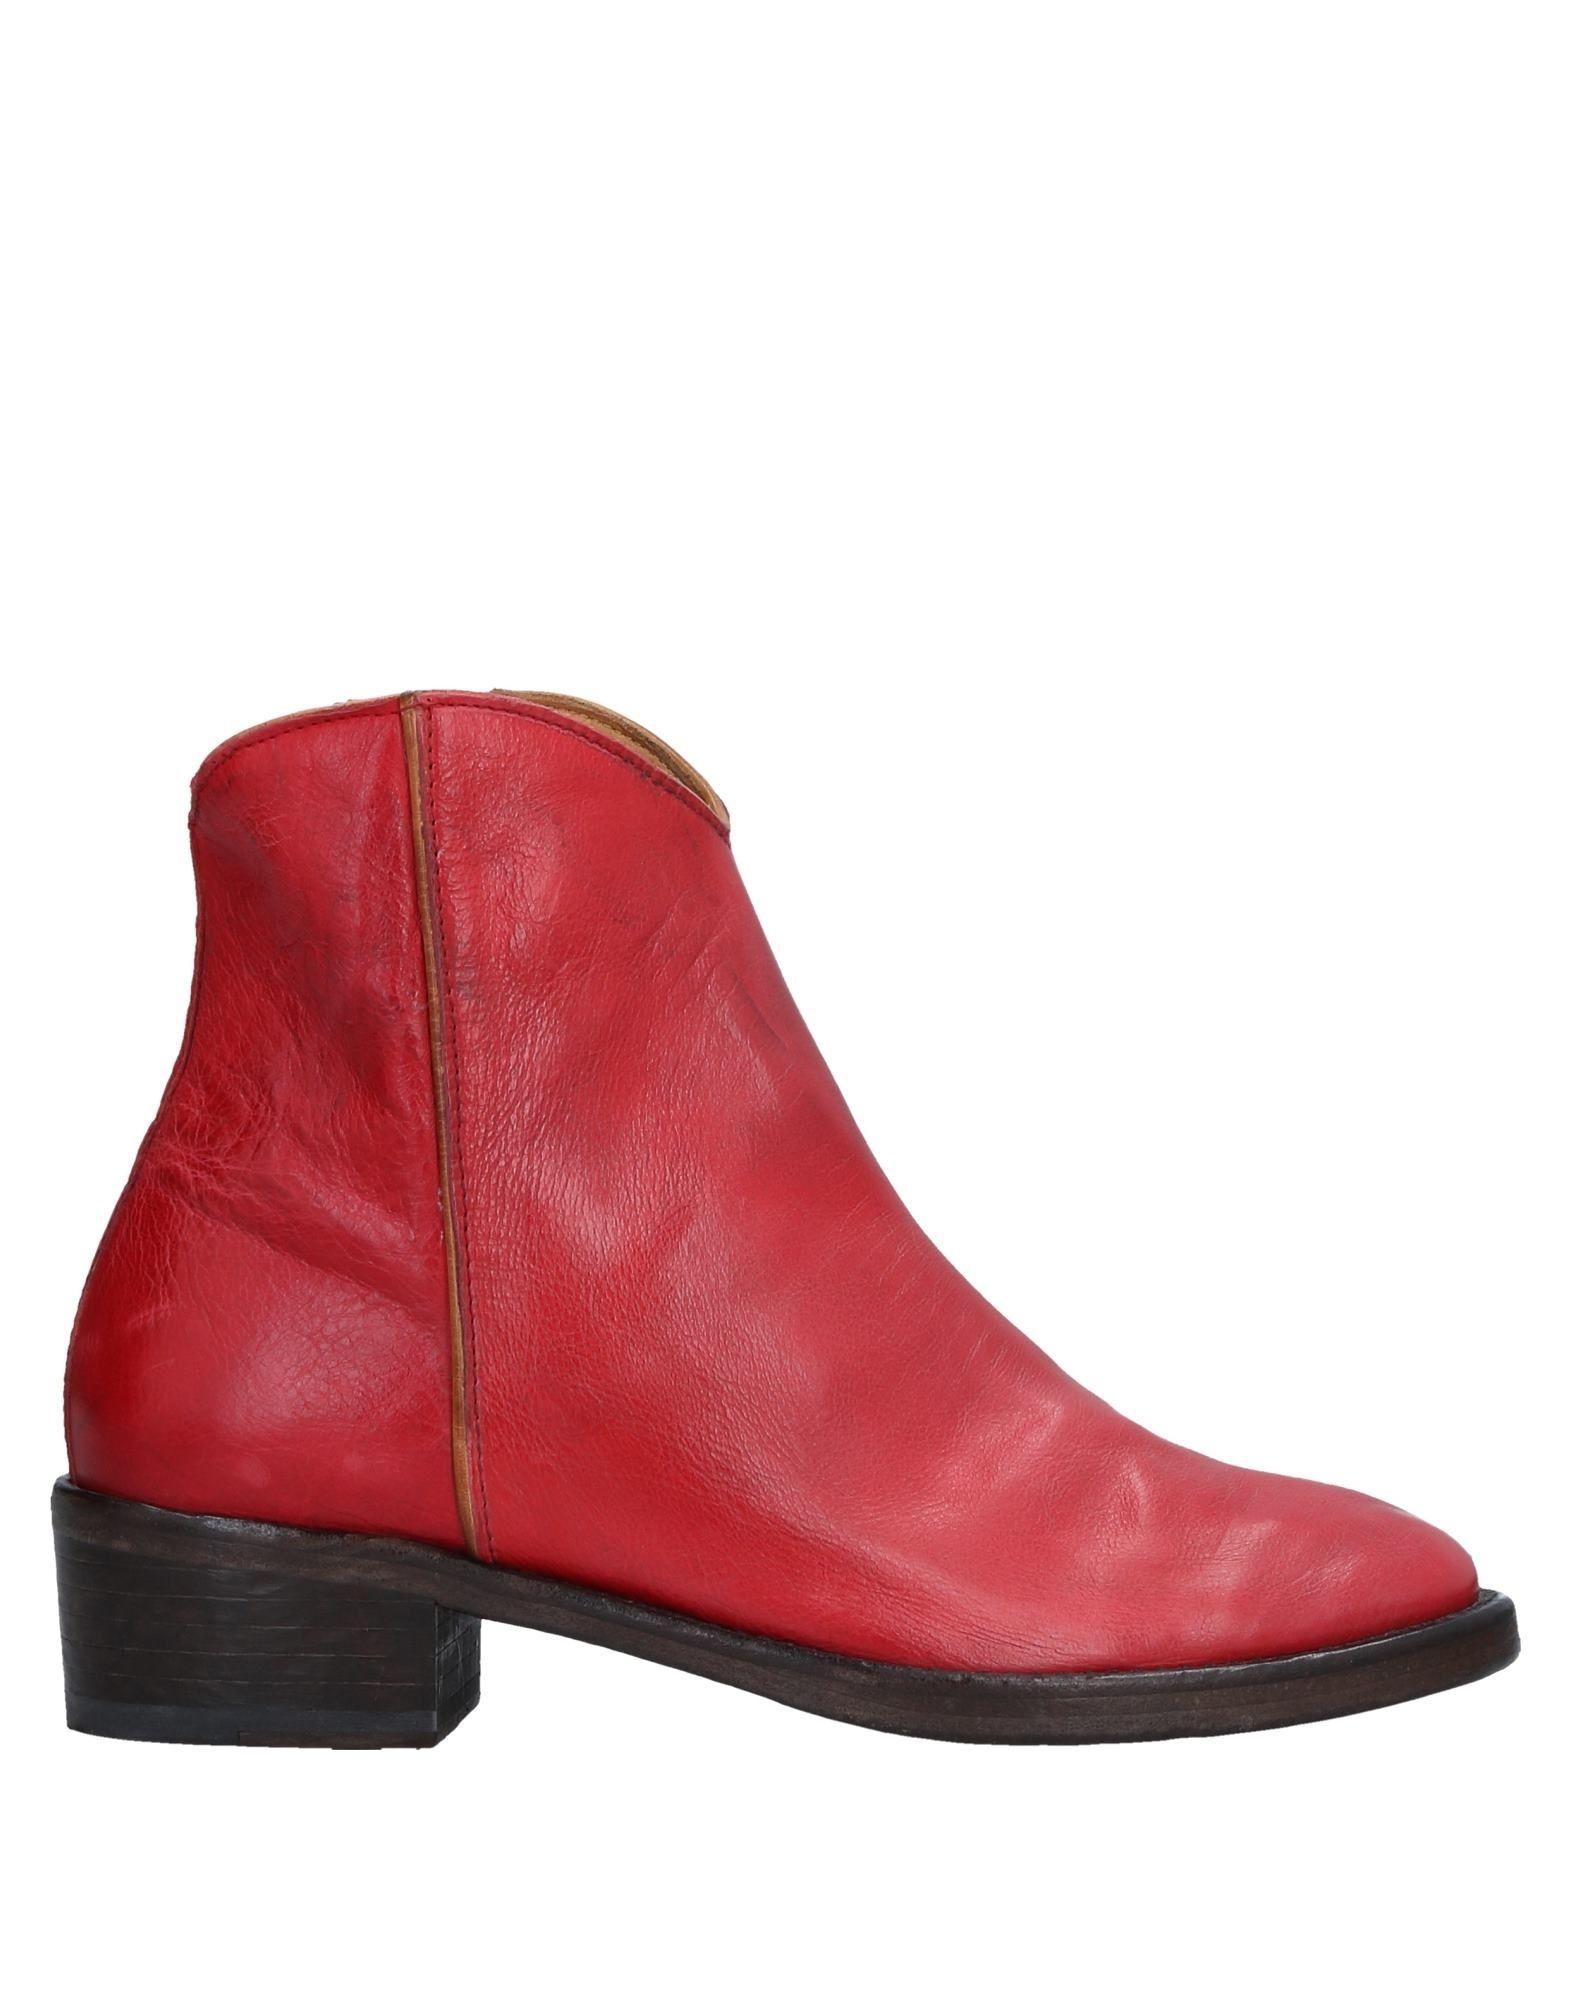 Seboy's on Ankle Boot - Women Seboy's Ankle Boots online on Seboy's  Australia - 11530705LK c6e22f